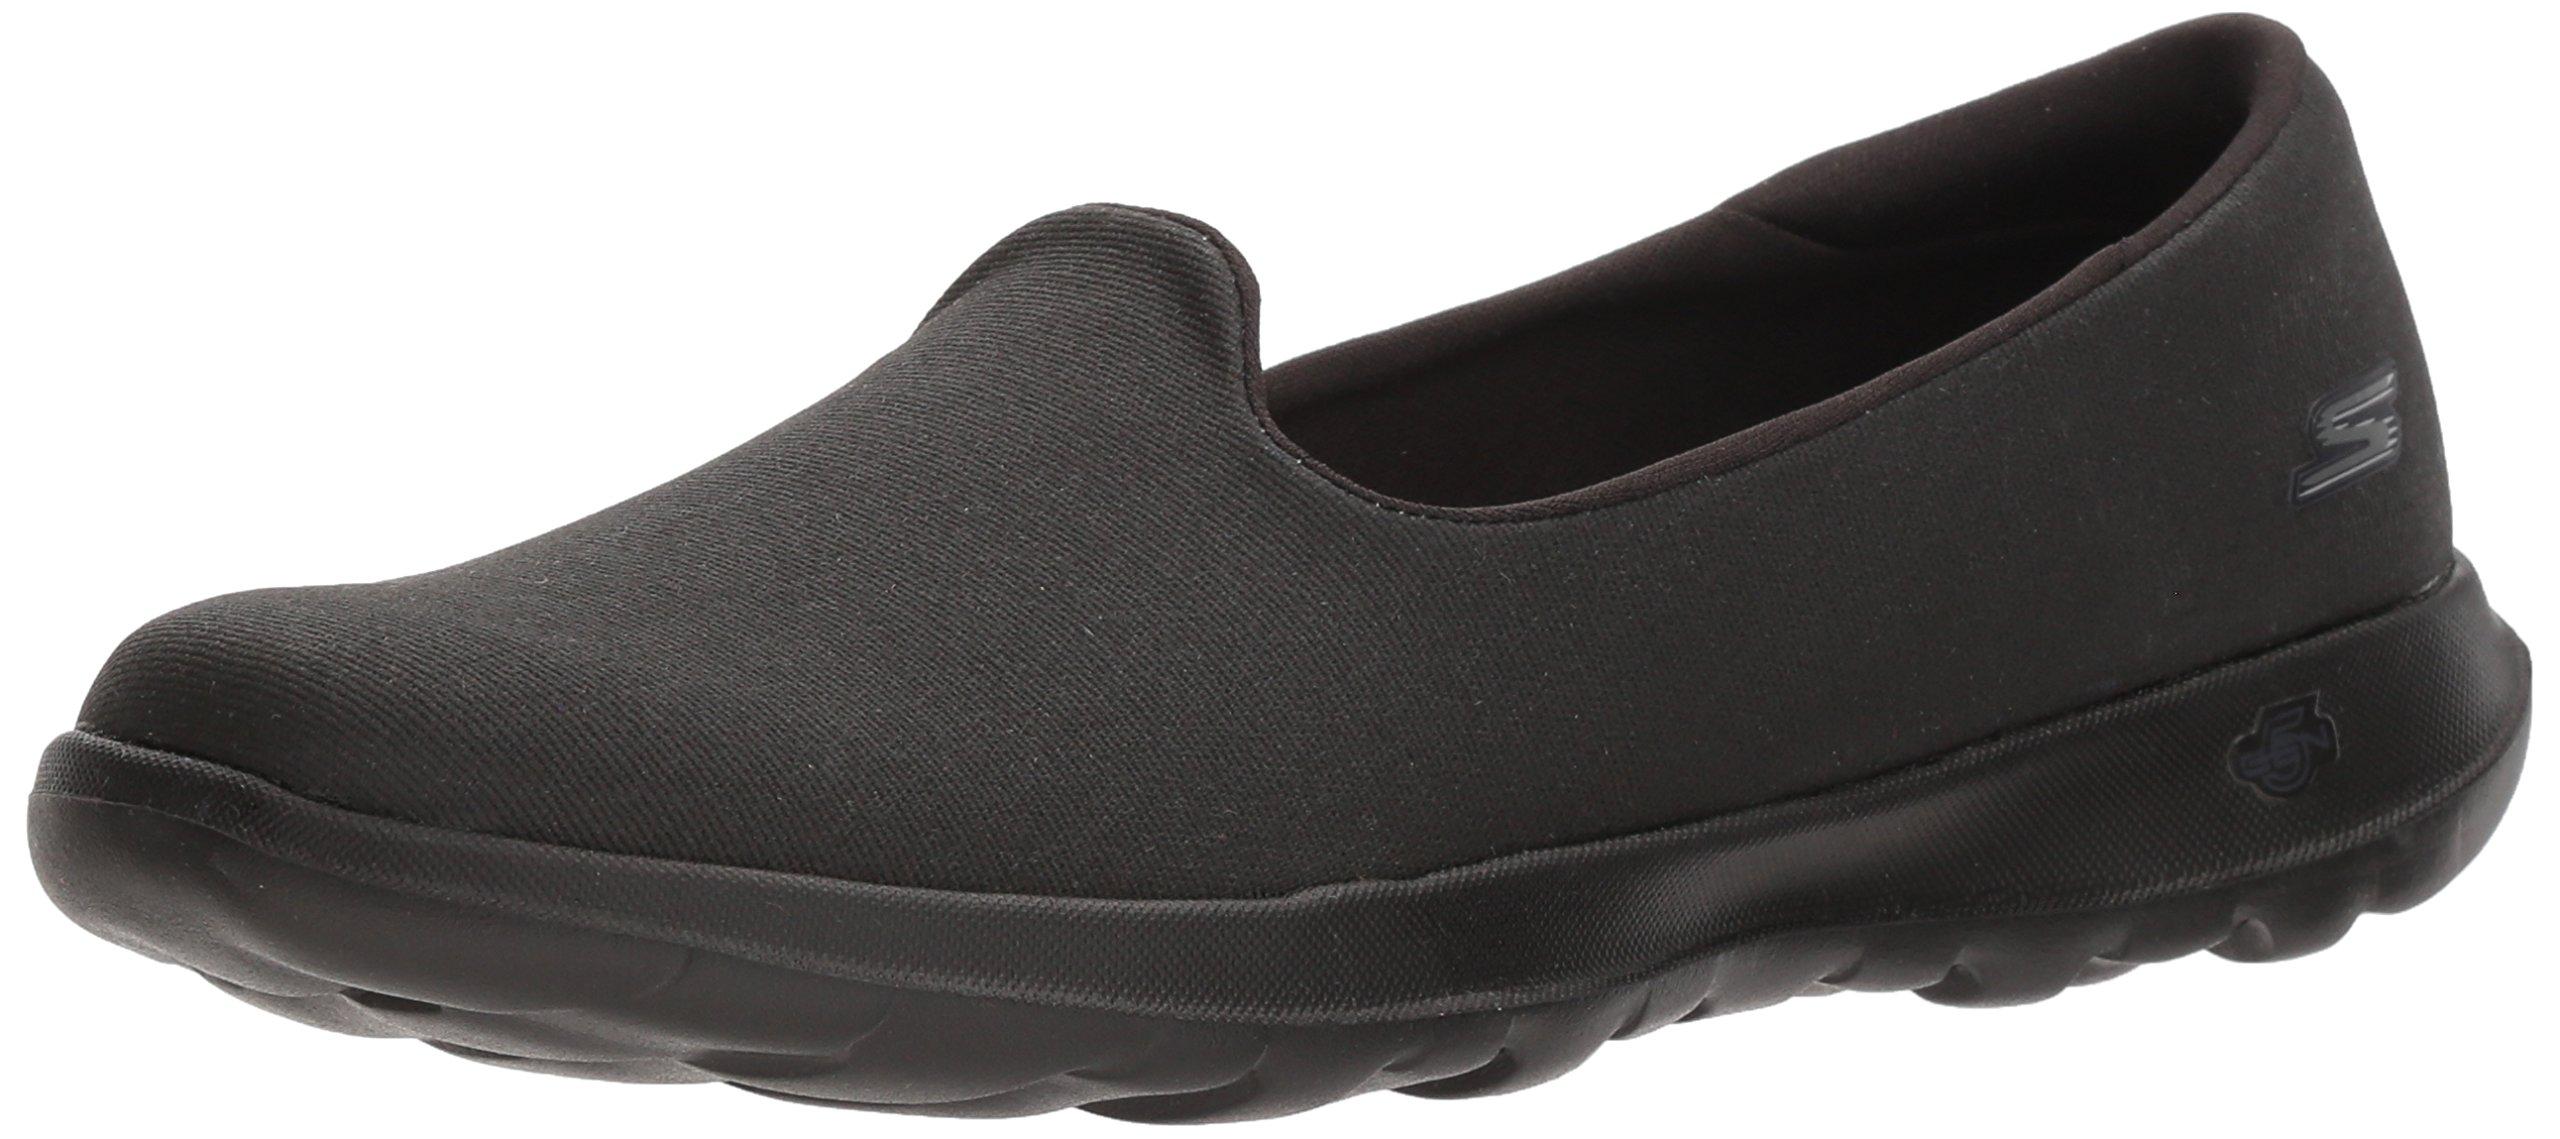 Skechers Performance Women's Go Walk Lite-15411 Loafer Flat,Black,7 M US